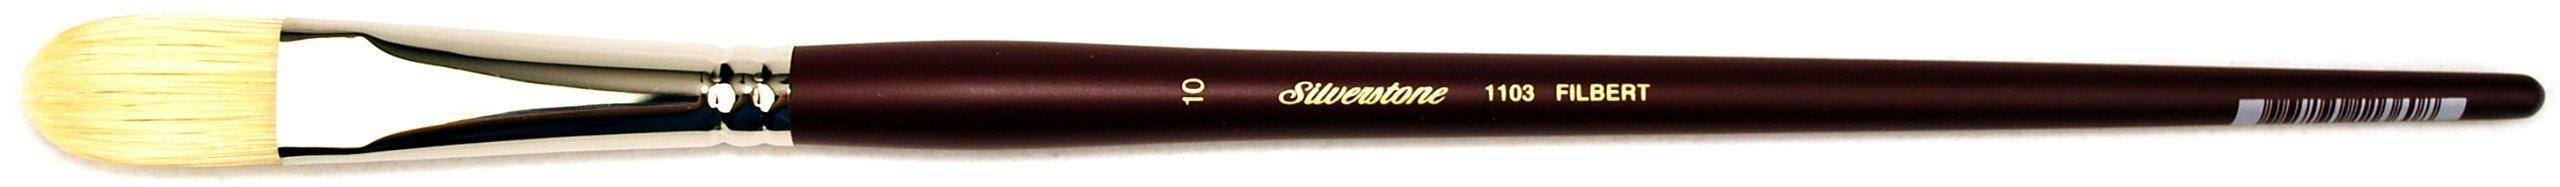 Silver Brush 1103-10 Silverstone Excellent Long Handle Hog Bristle Brush, Filbert, Size 10